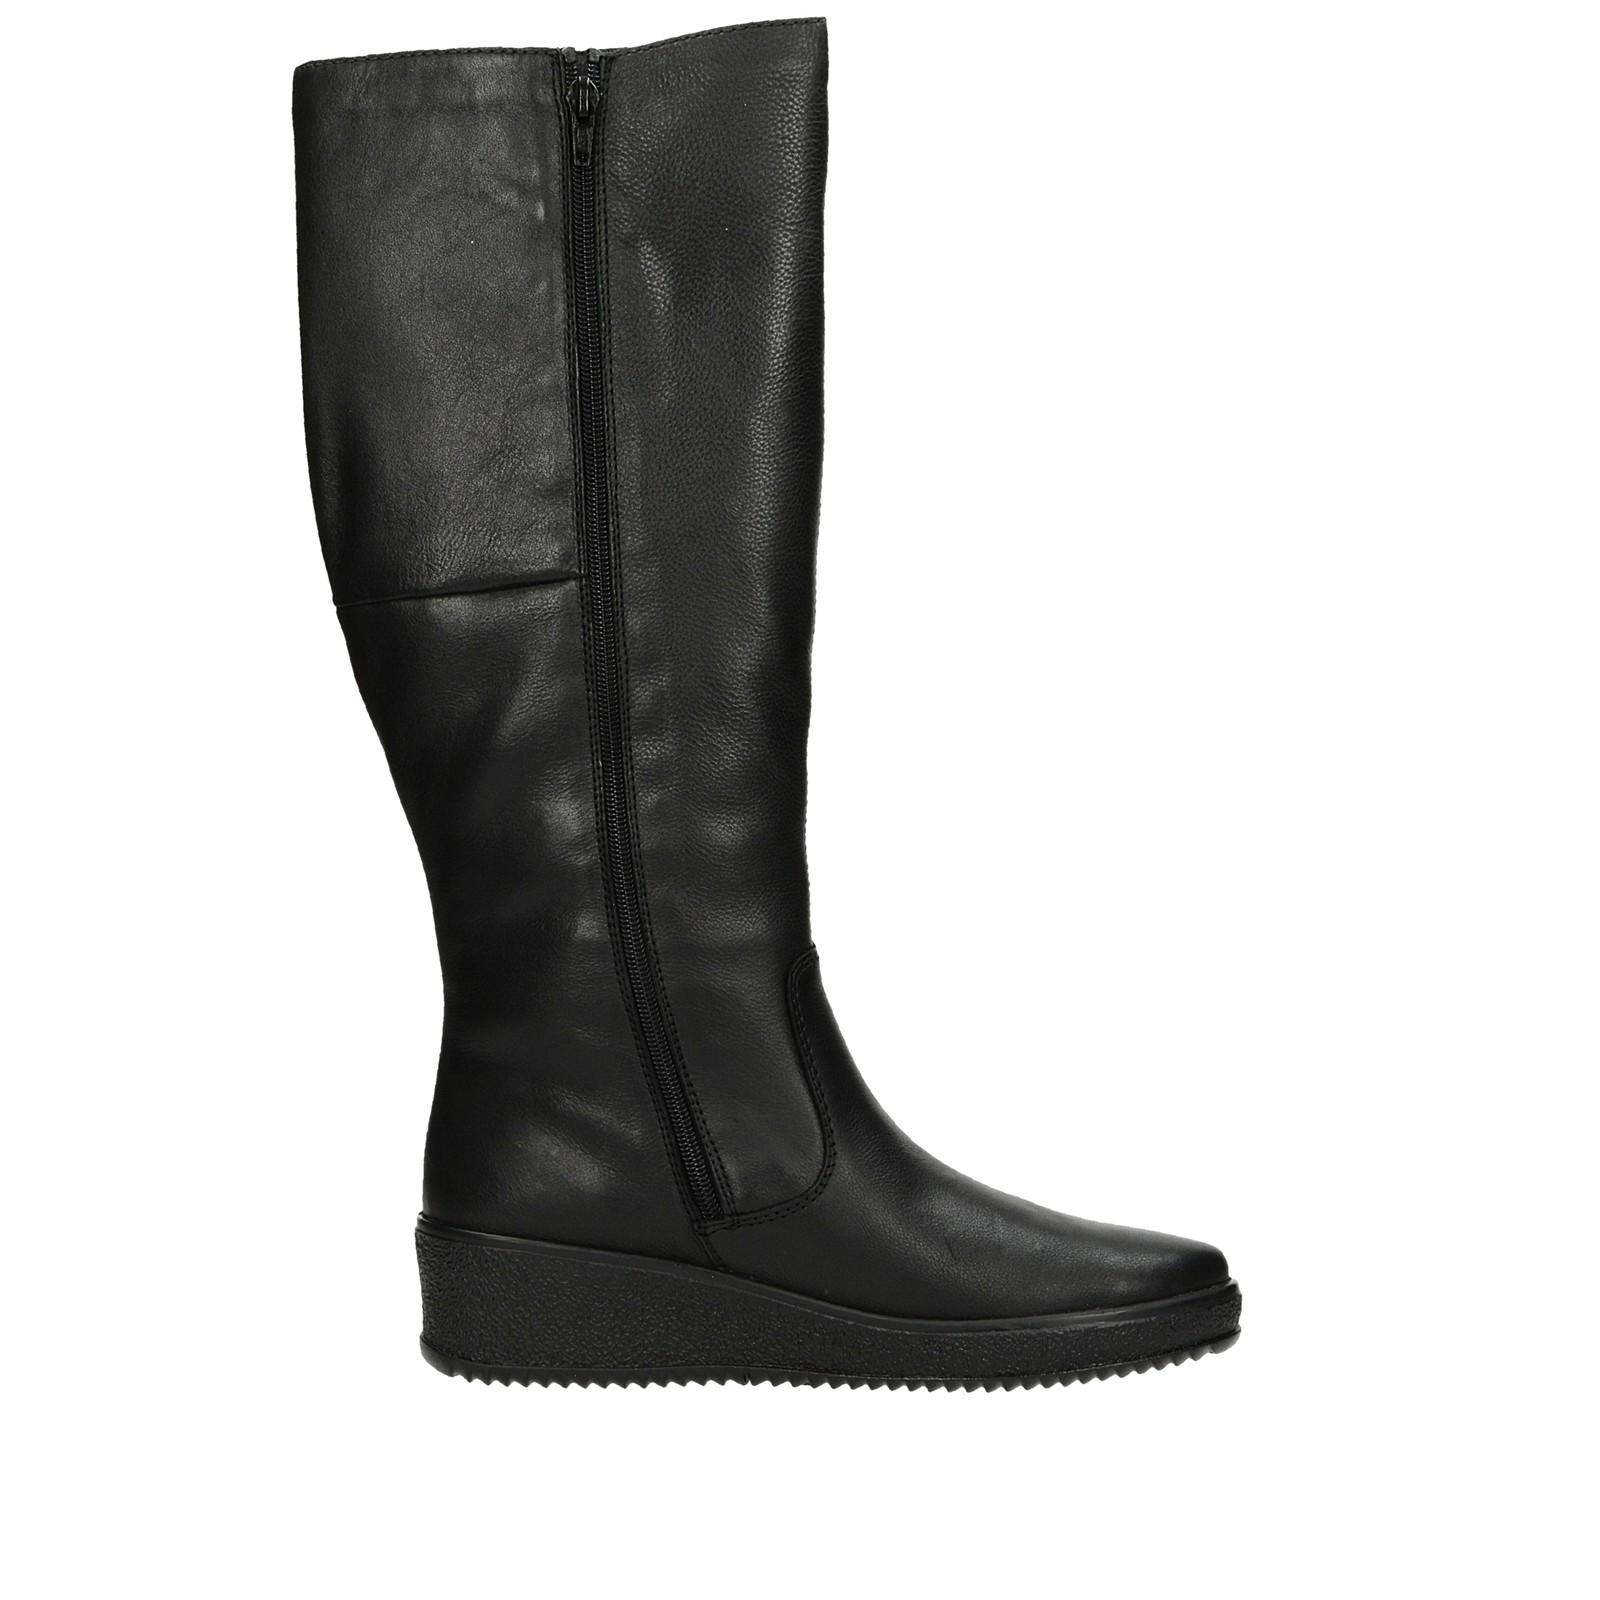 f29df54a80a5f Rieker dámske štýlové vysoké čižmy - čierne | Y446000-BLK www.robel.sk